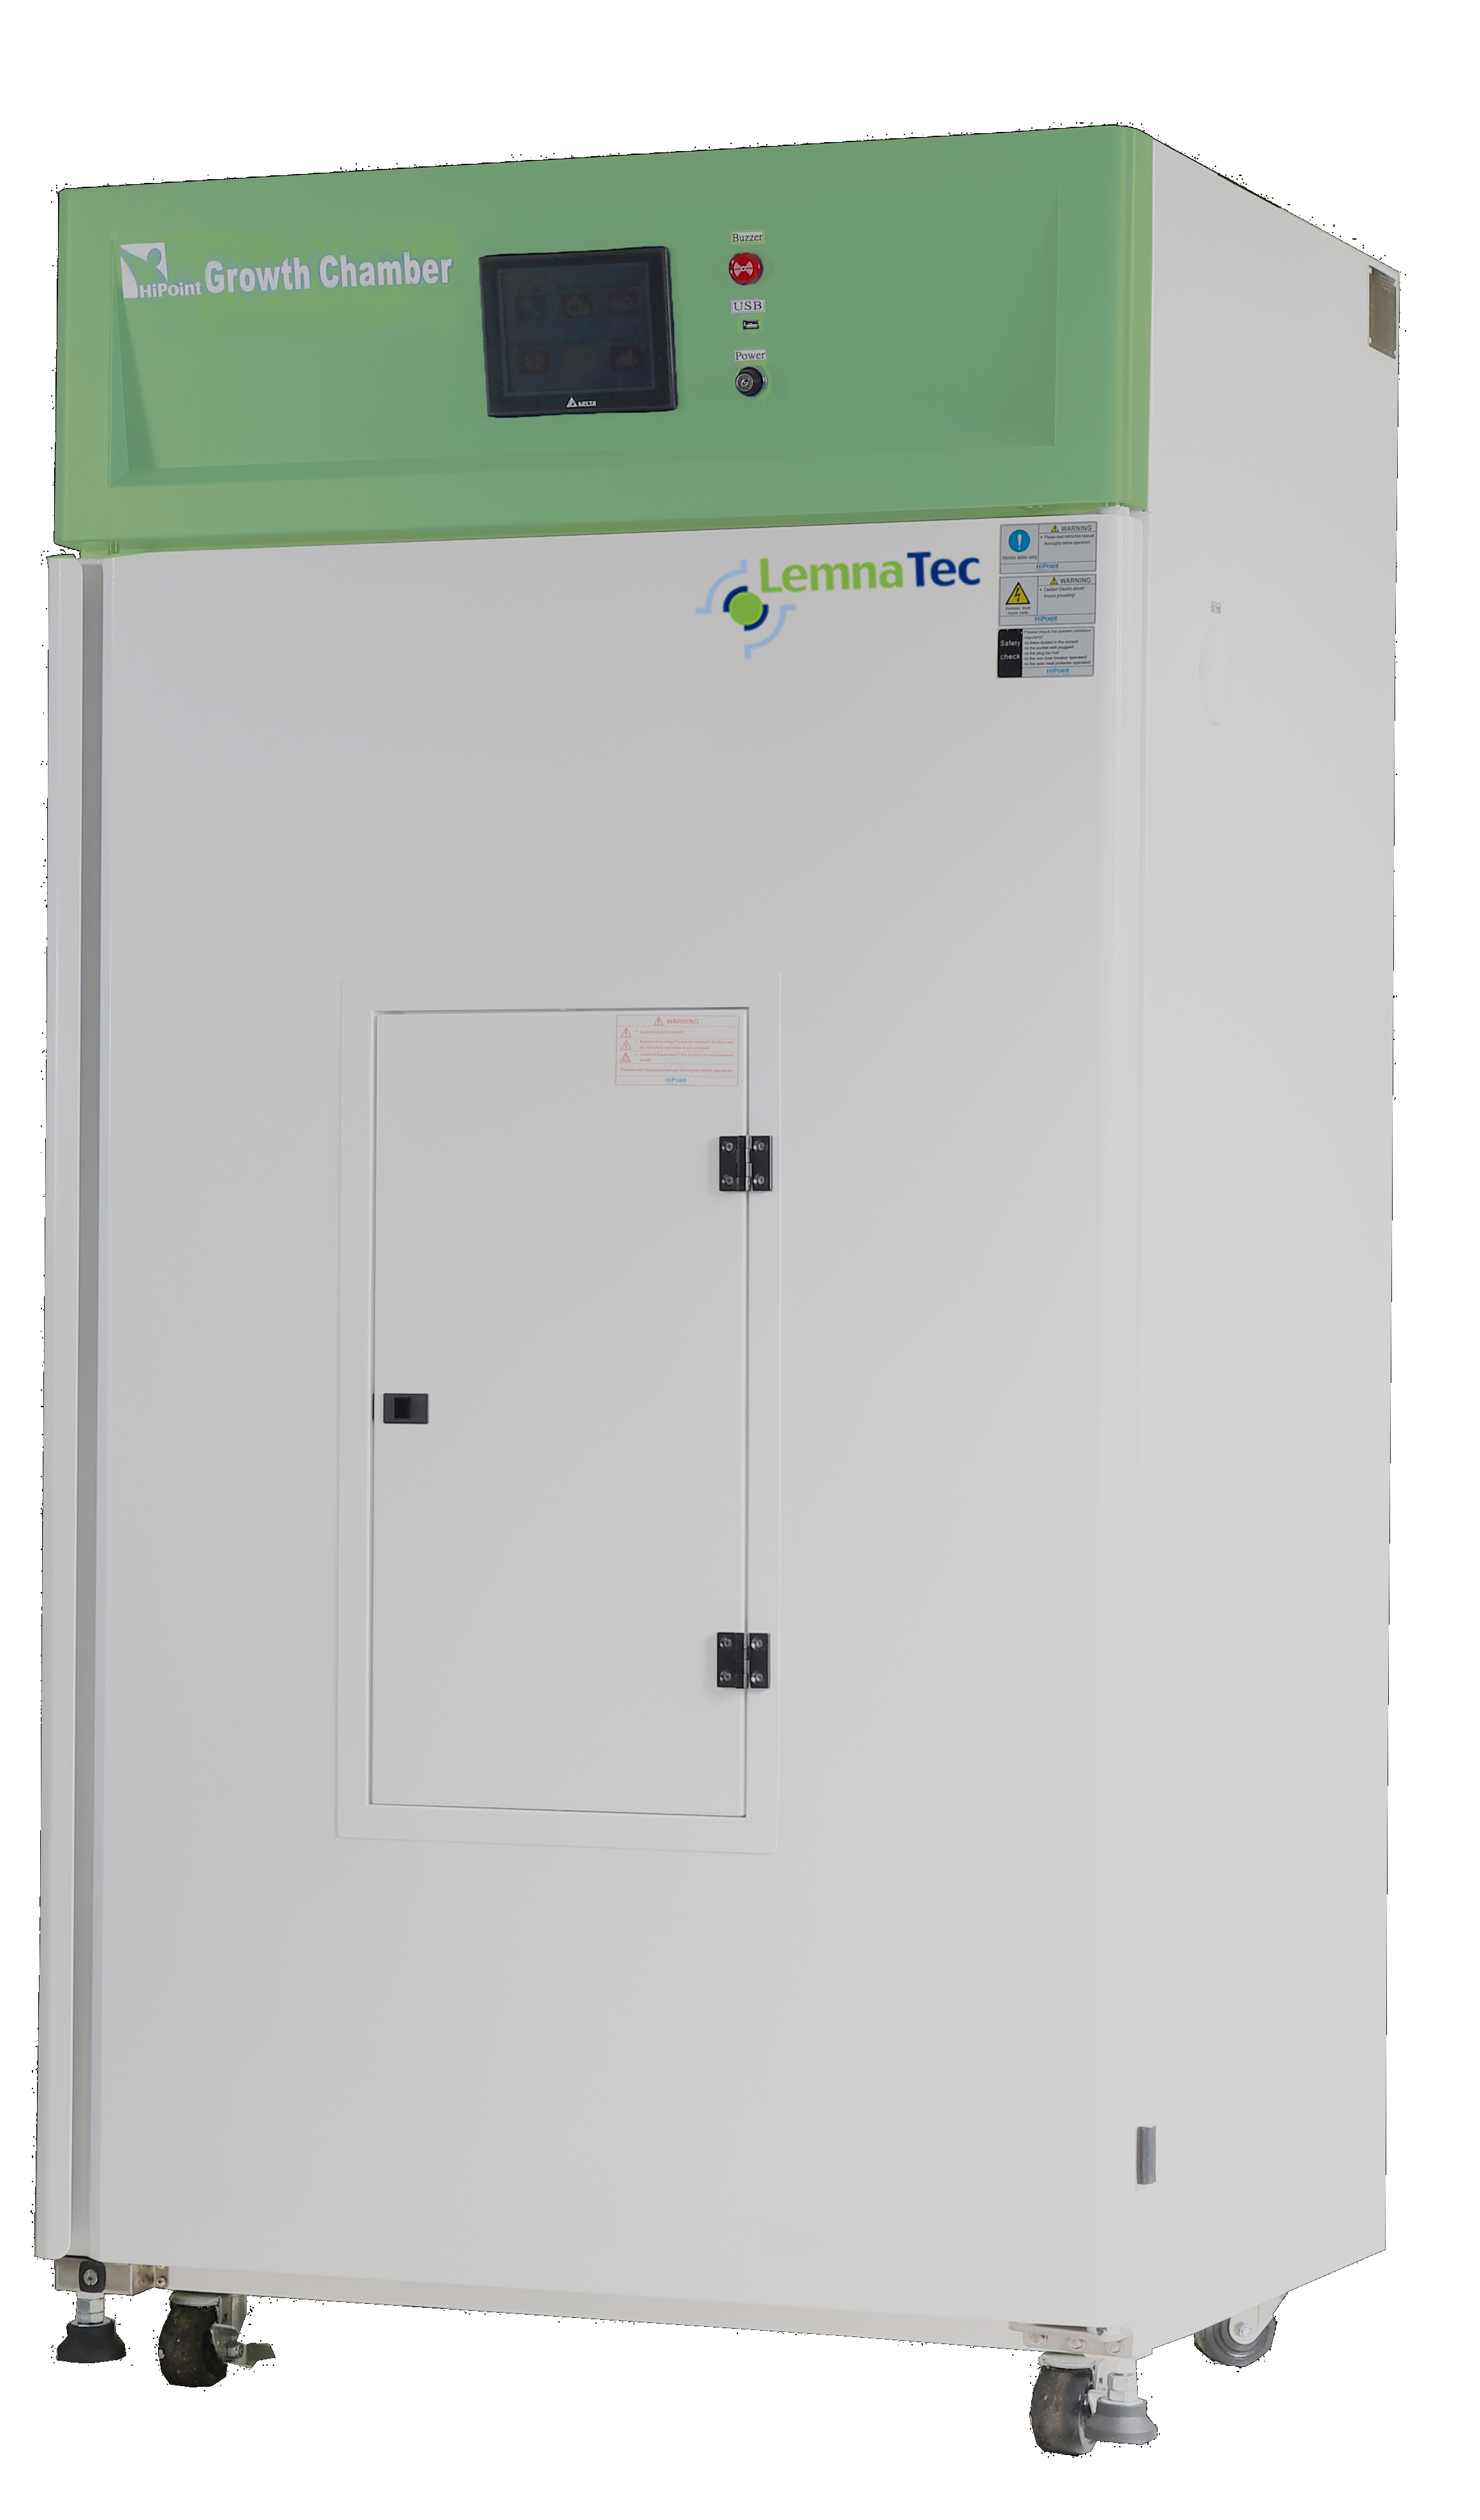 LemnaTec Climate Cabinet Model 1200